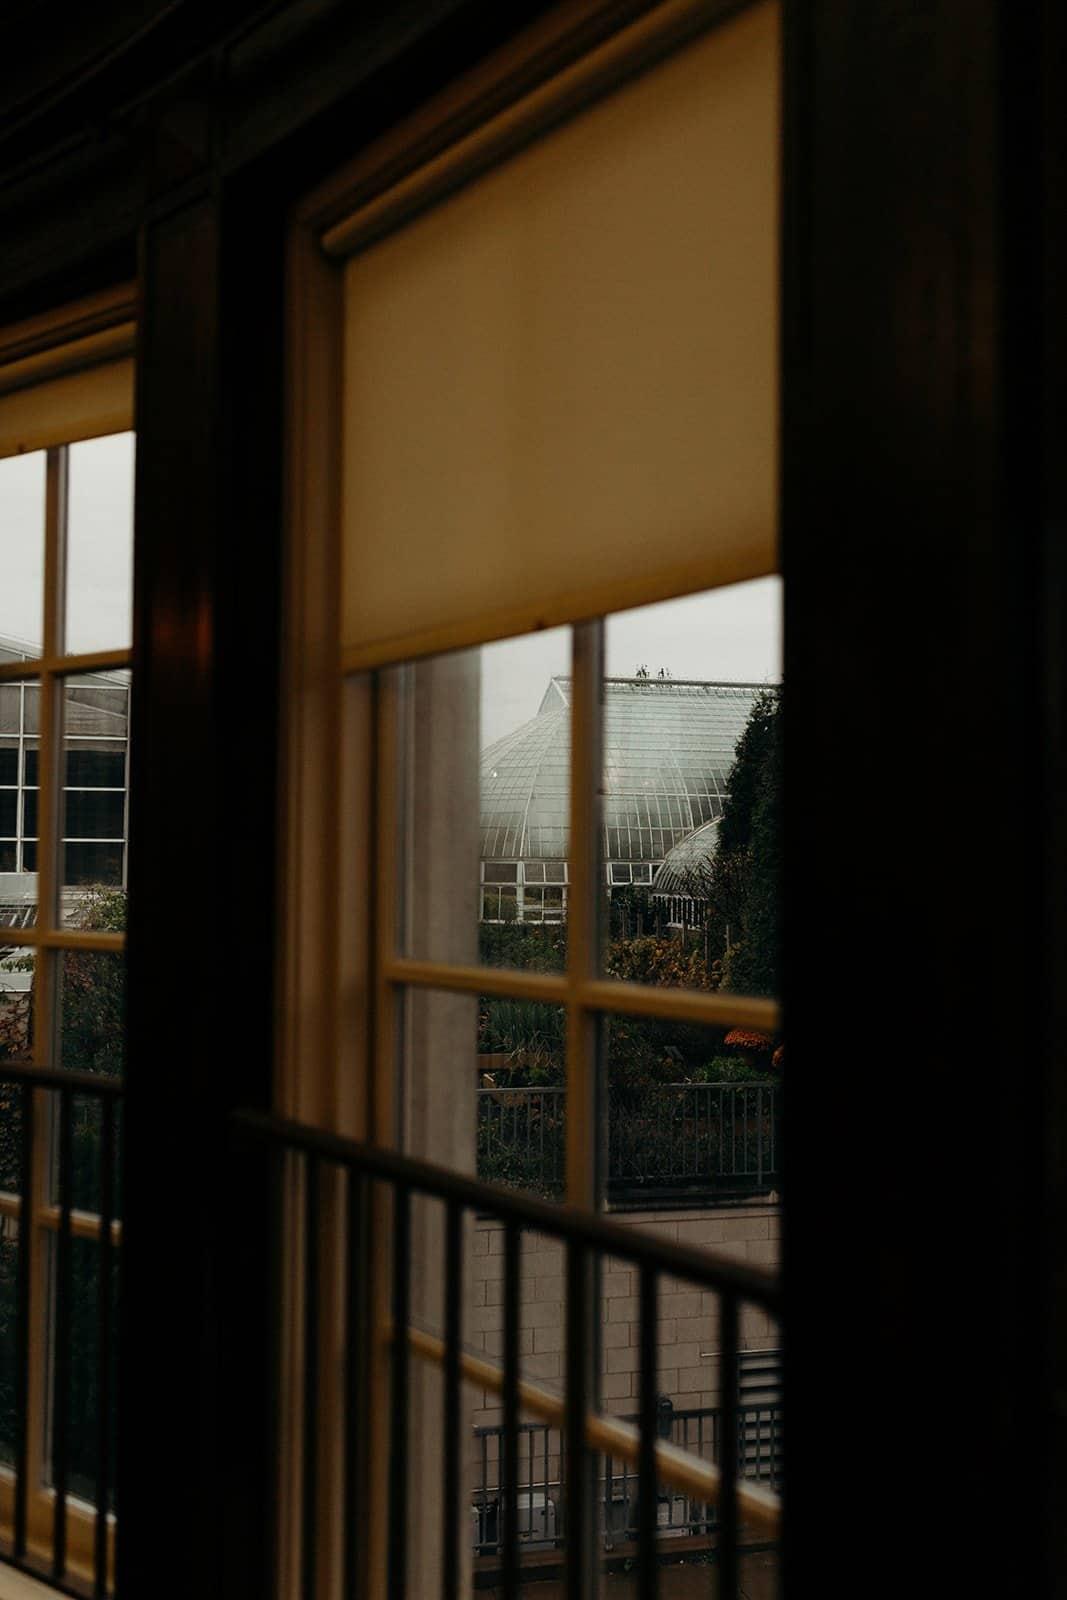 Phipps Conservatory through a window pane